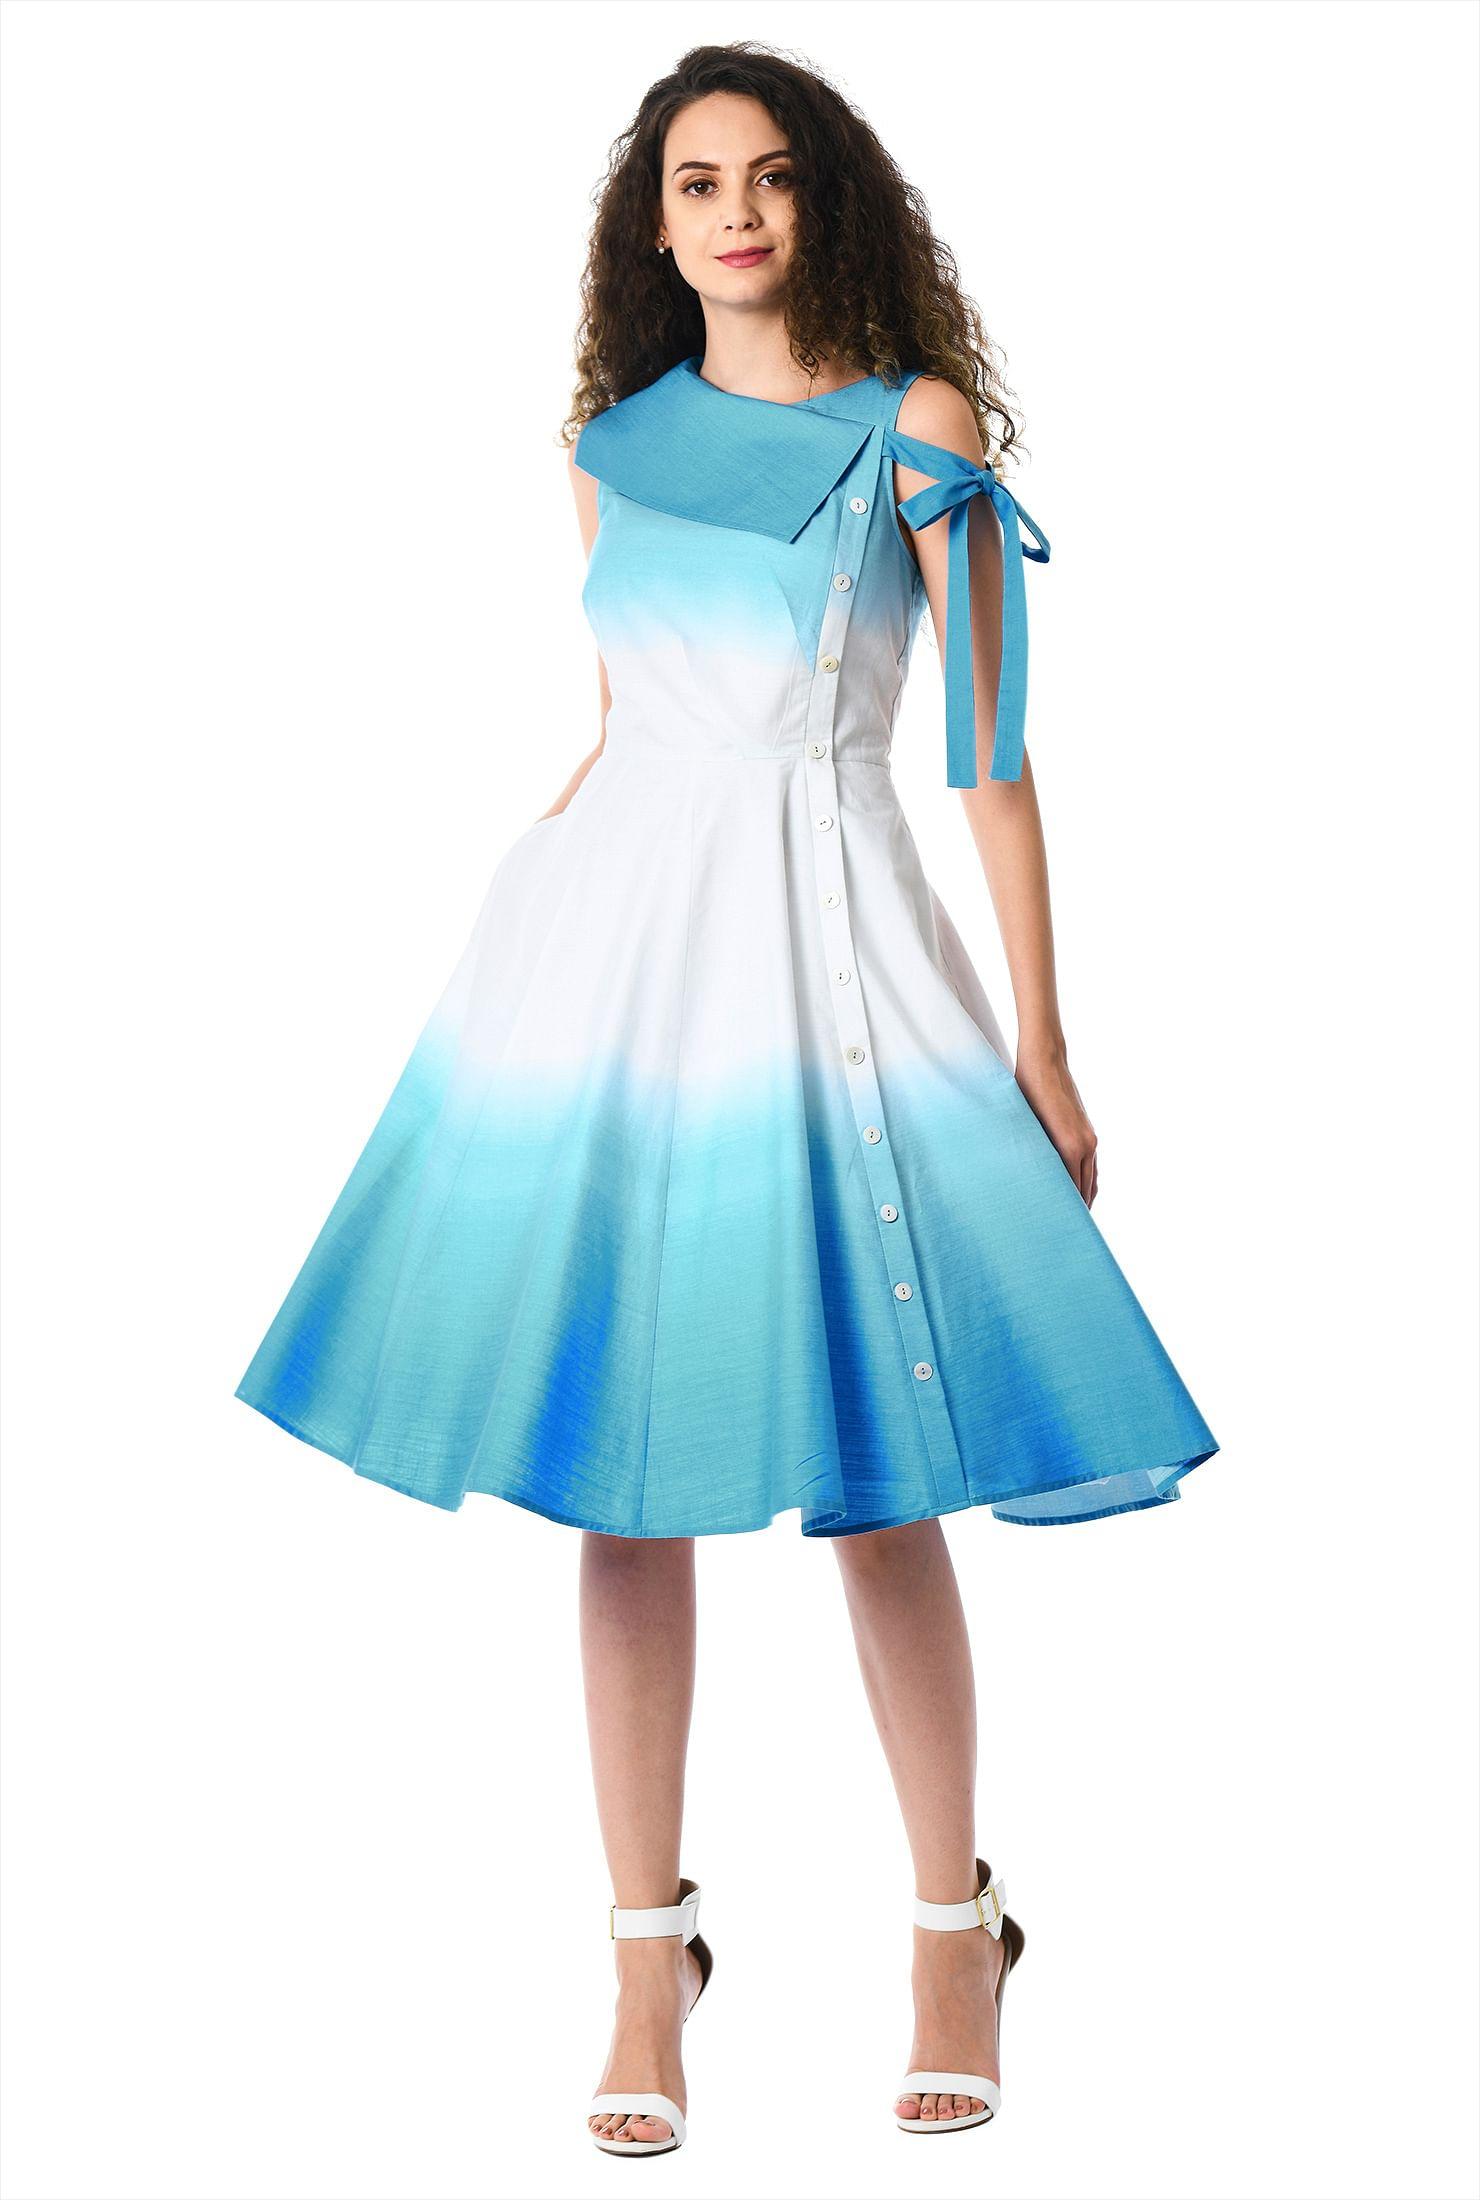 Asymmetric Collar Side Tie Ombre Cotton Dress by Eshakti